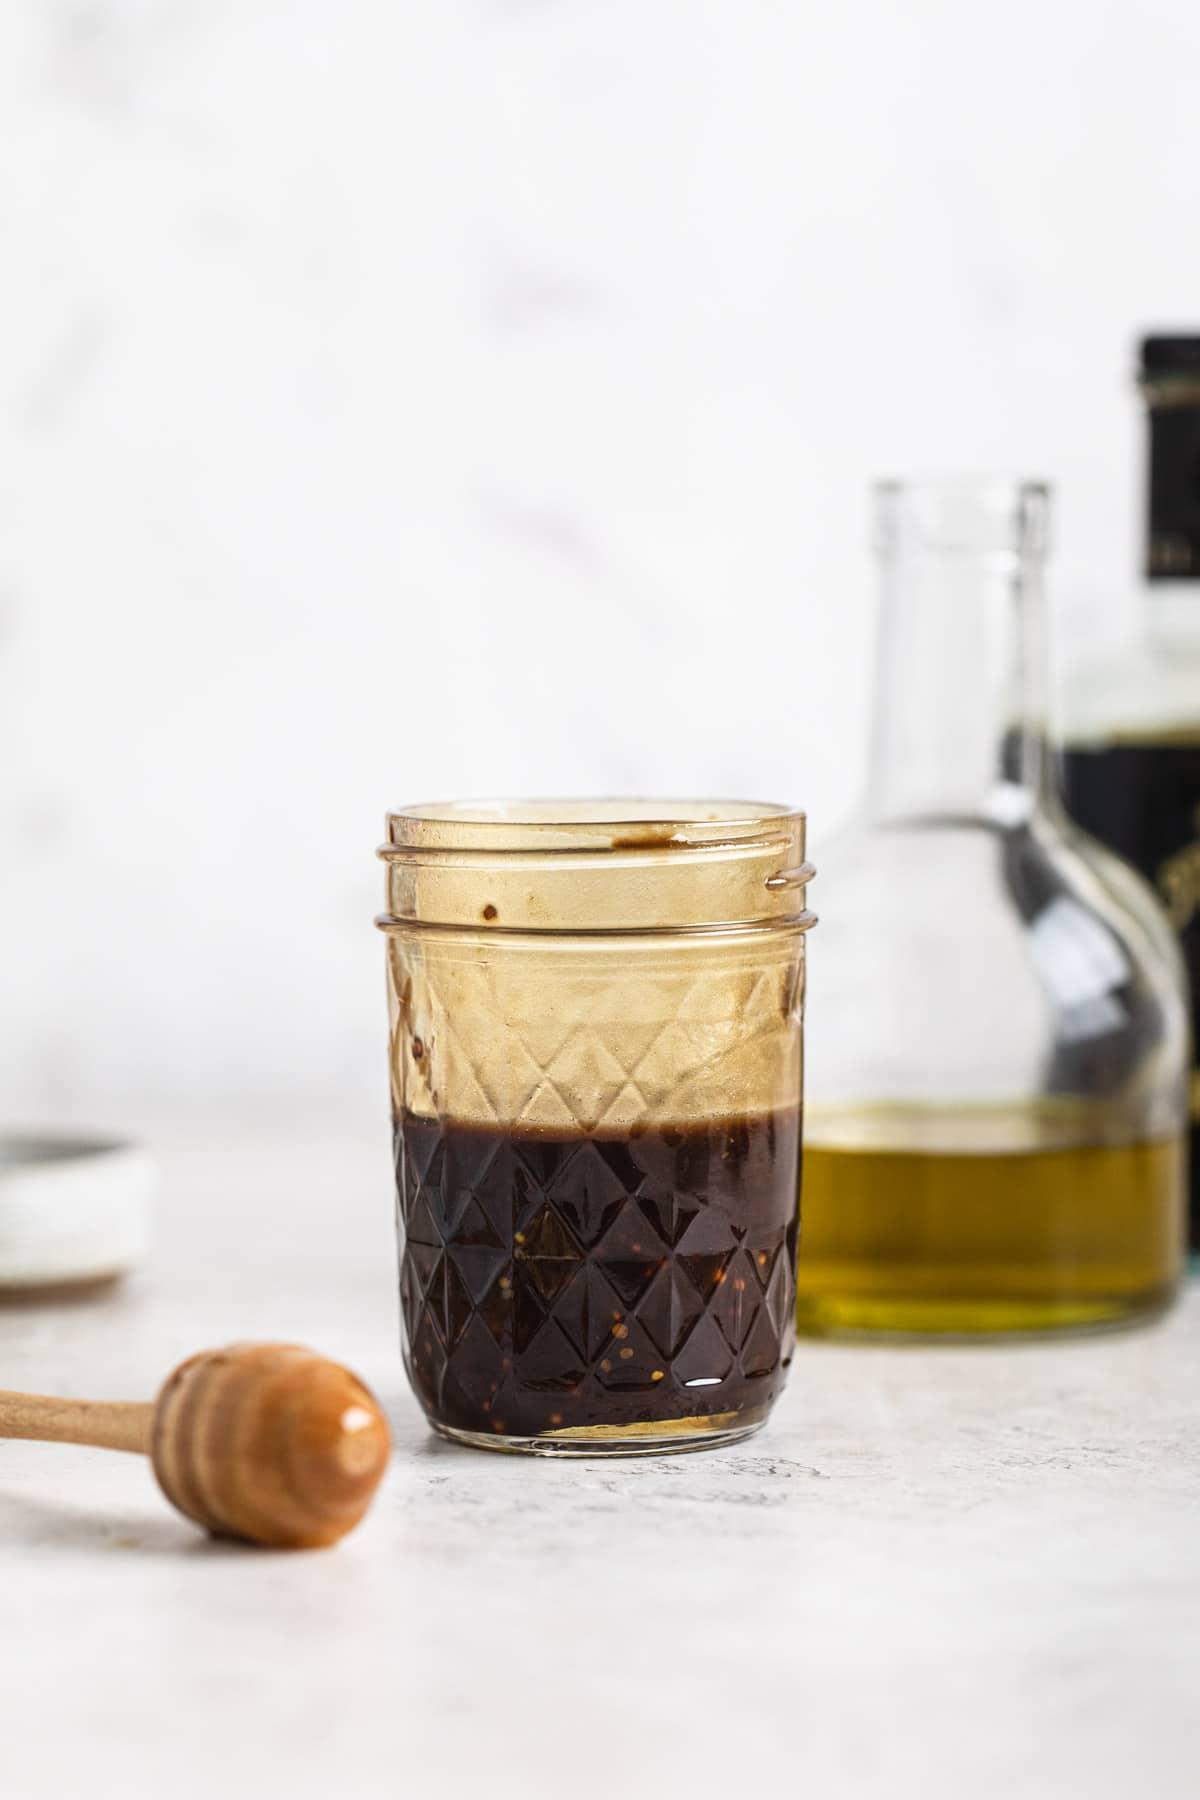 honey balsamic dressing in jar, extra virgin olive oil in glass jug in background